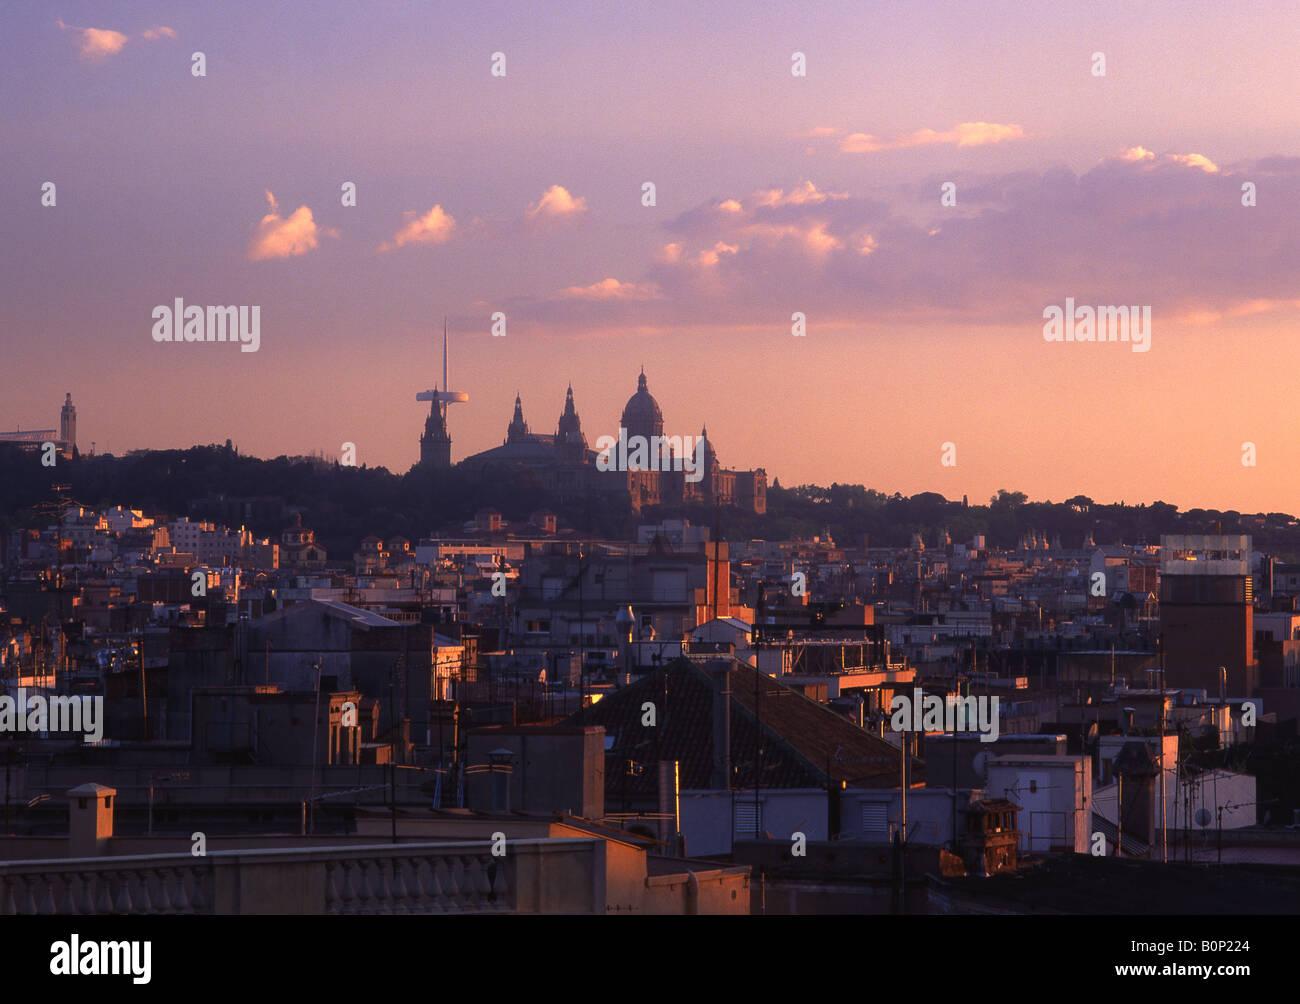 View over rooftops of Raval to Palau Nacional and Montjuic Barcelona Catalunya Spain - Stock Image